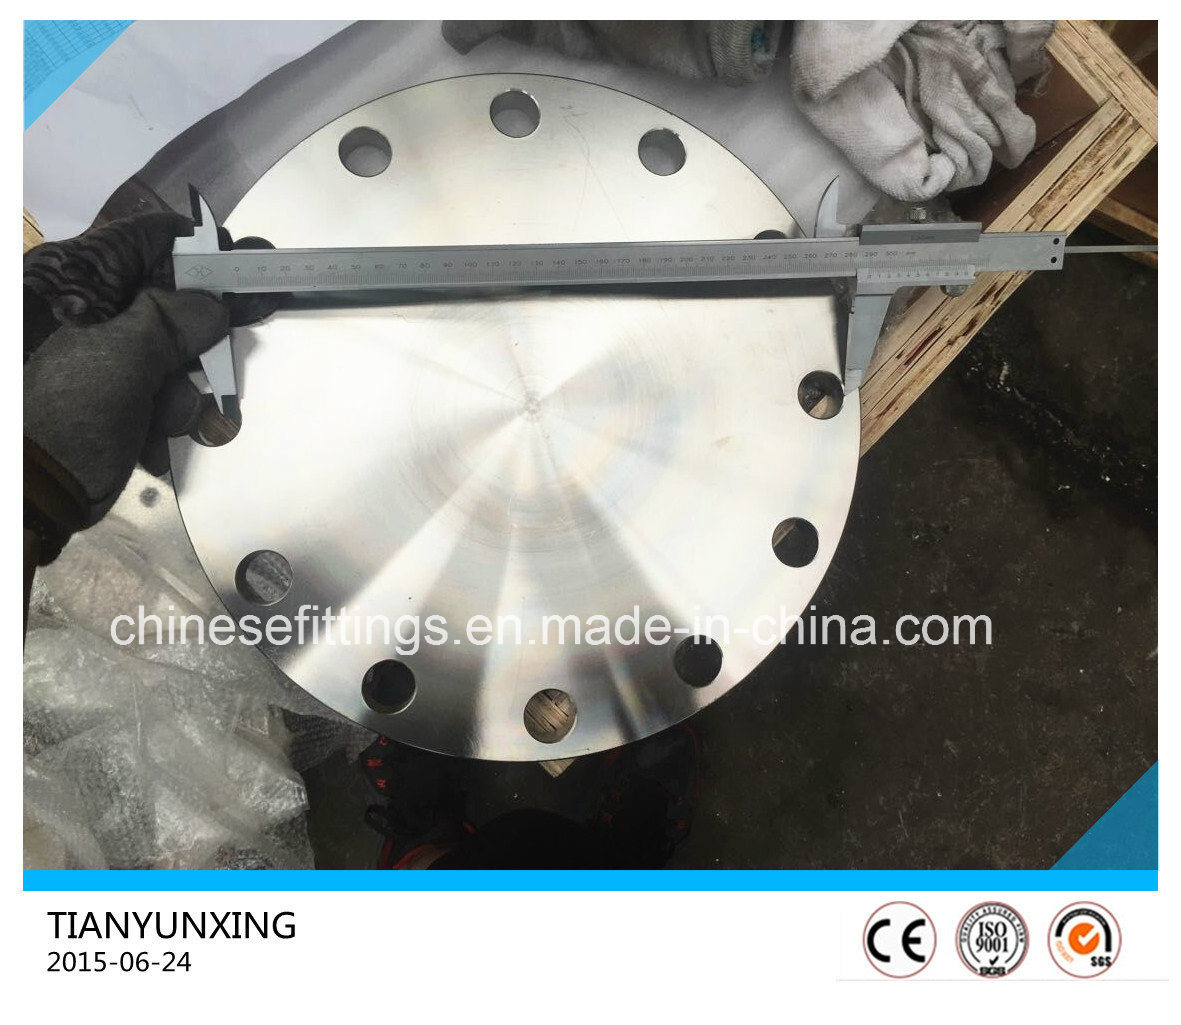 Forged JIS B2220 S31803 Deplex Stainless Steel Blind Flange